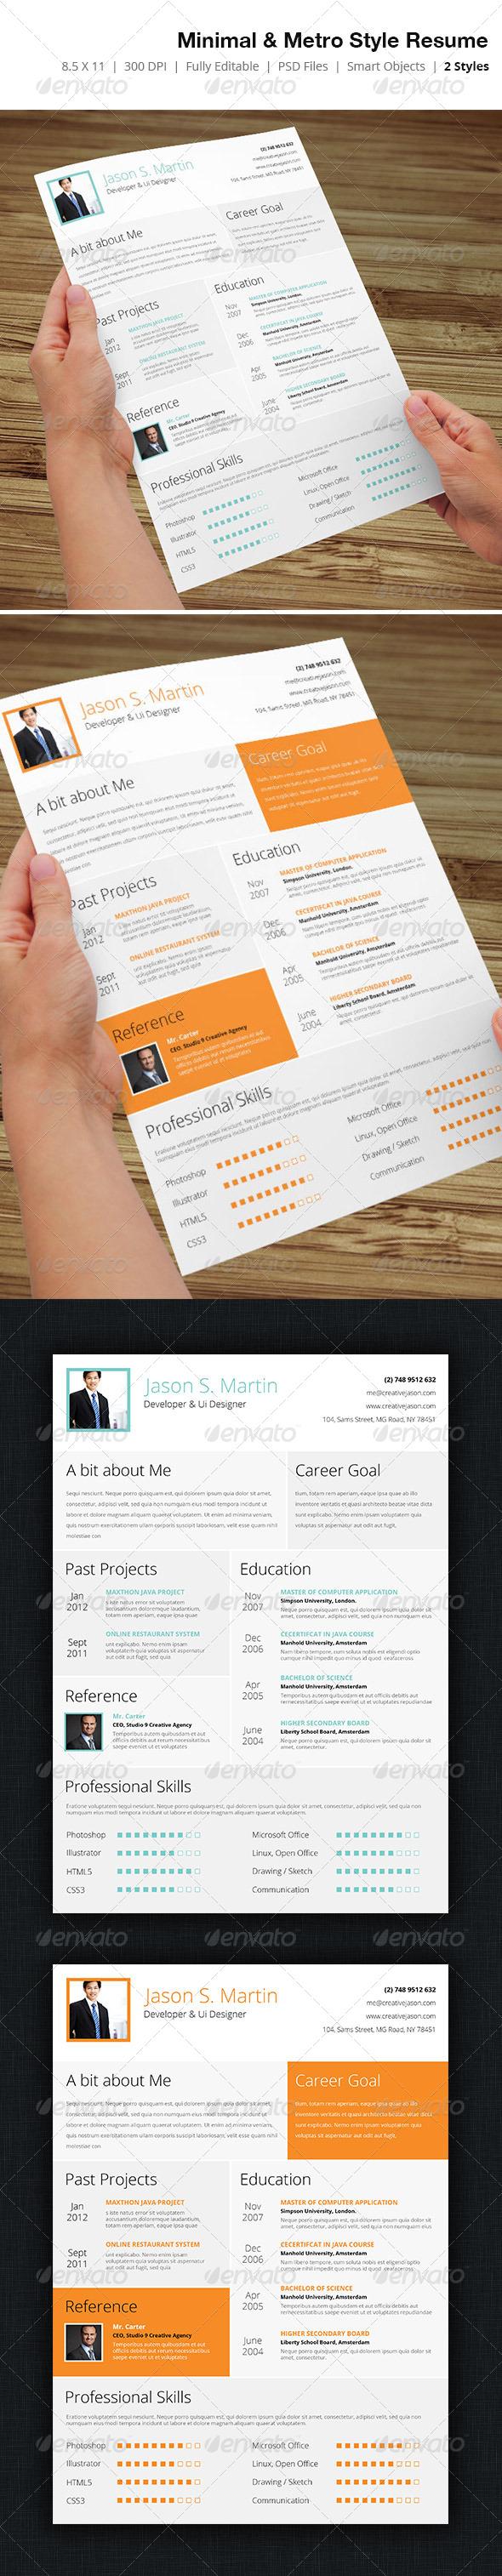 GraphicRiver Metro & Minimal Style Business Resume 02 5065510